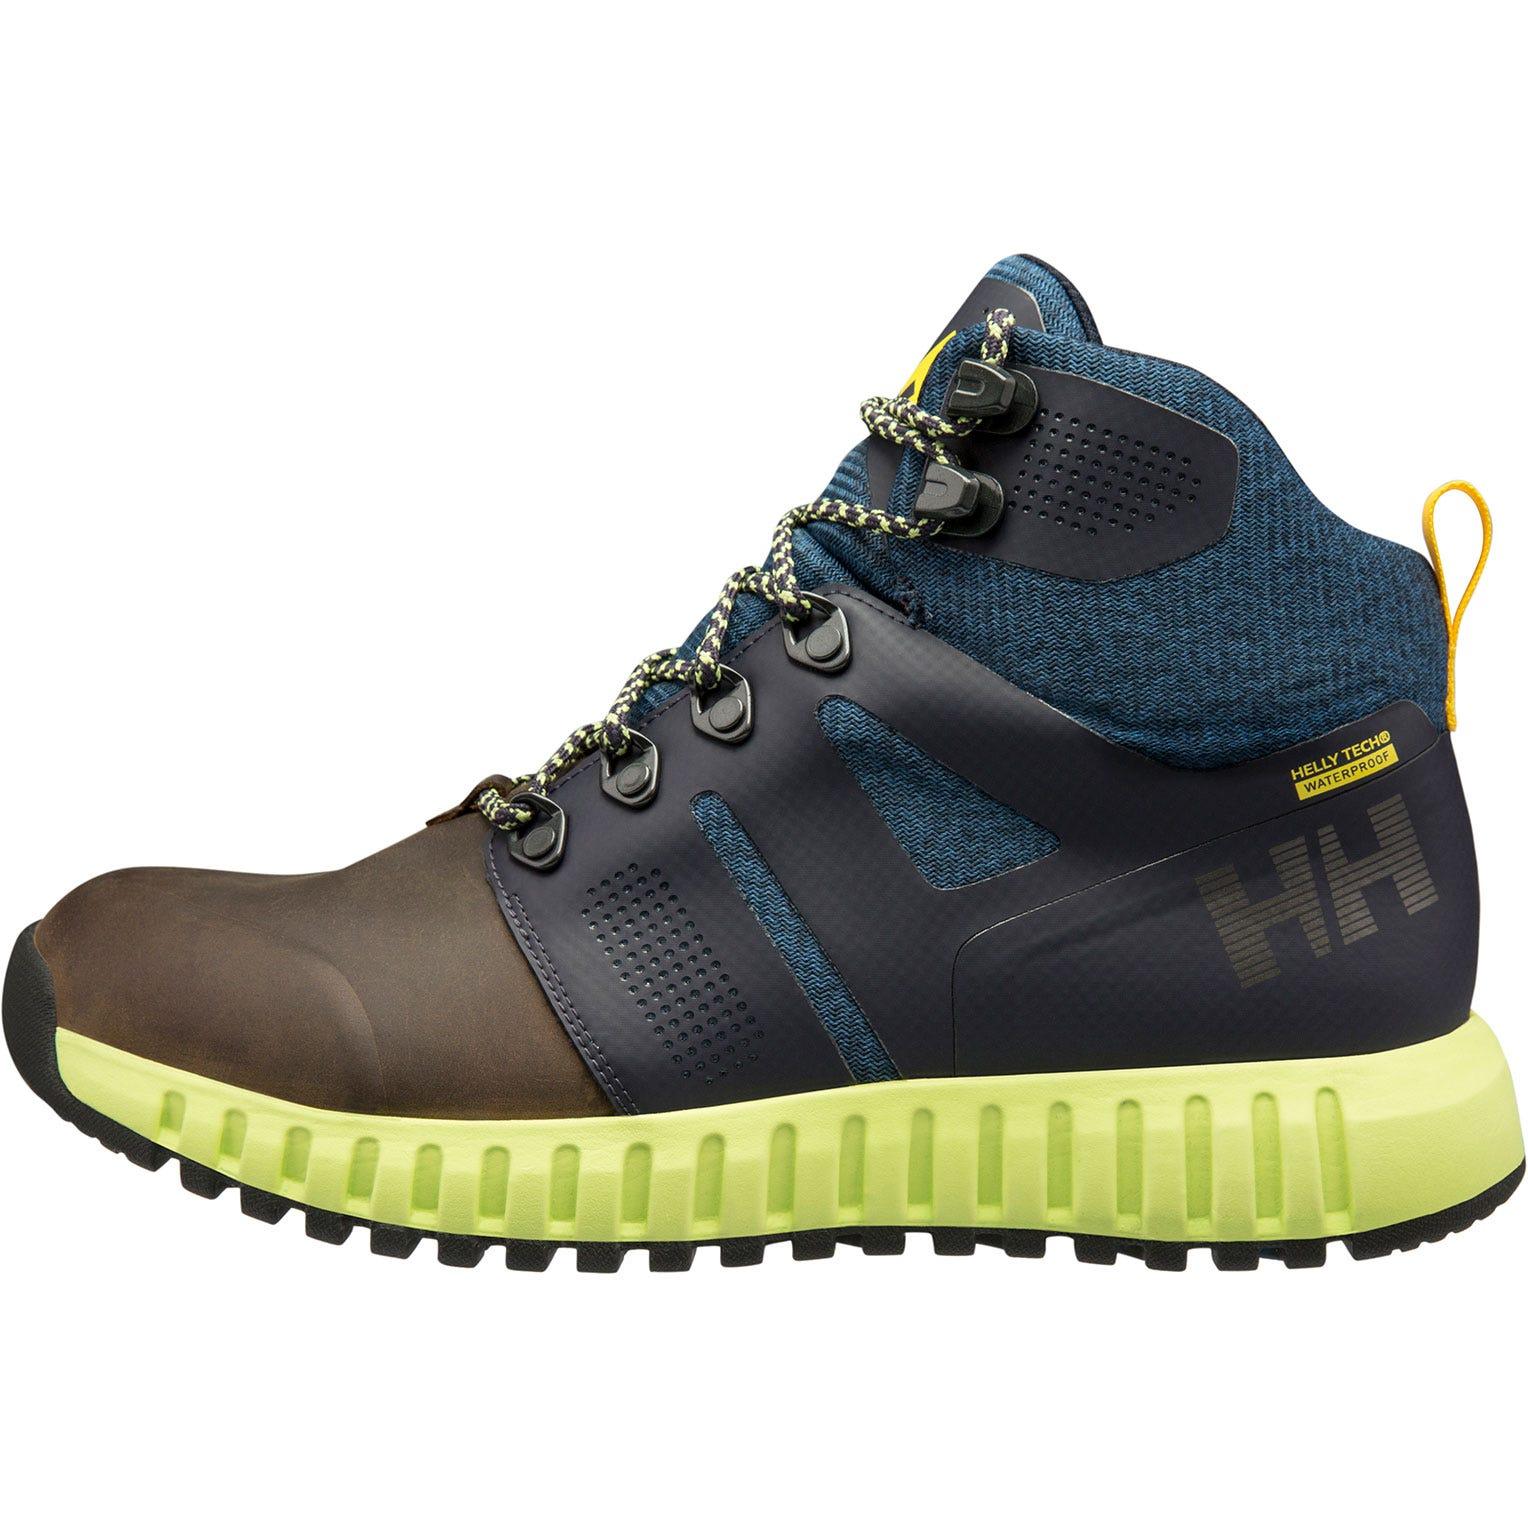 Helly Hansen Vanir Gallivant Ht Mens Hiking Boot Blue 42/8.5